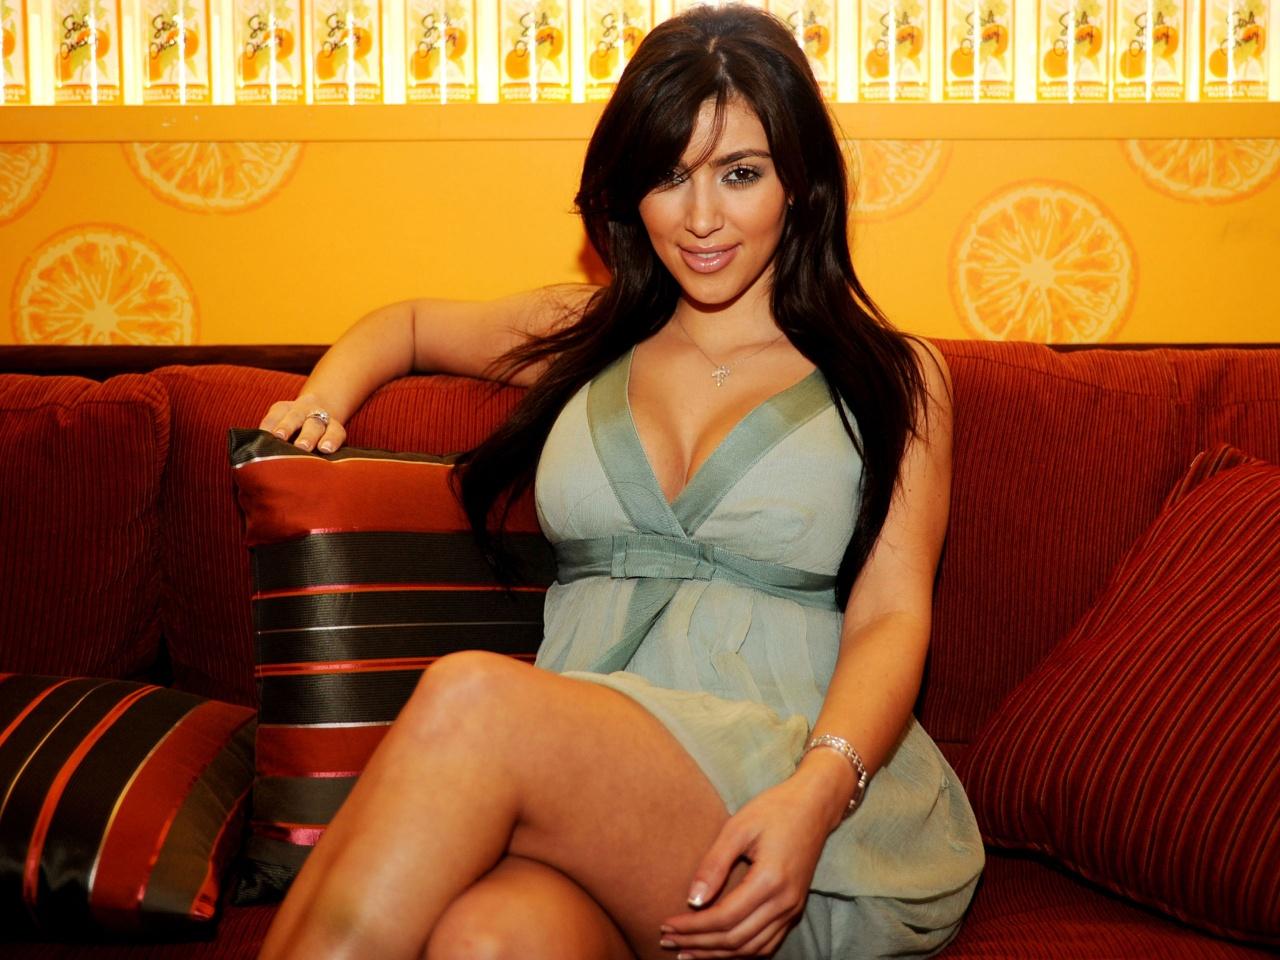 http://1.bp.blogspot.com/_nD_YgZuOadA/TKQDZ4_5muI/AAAAAAAABMA/LSH5D-gOs7Q/s1600/kim_kardashian_high_quality-1280x960.jpg